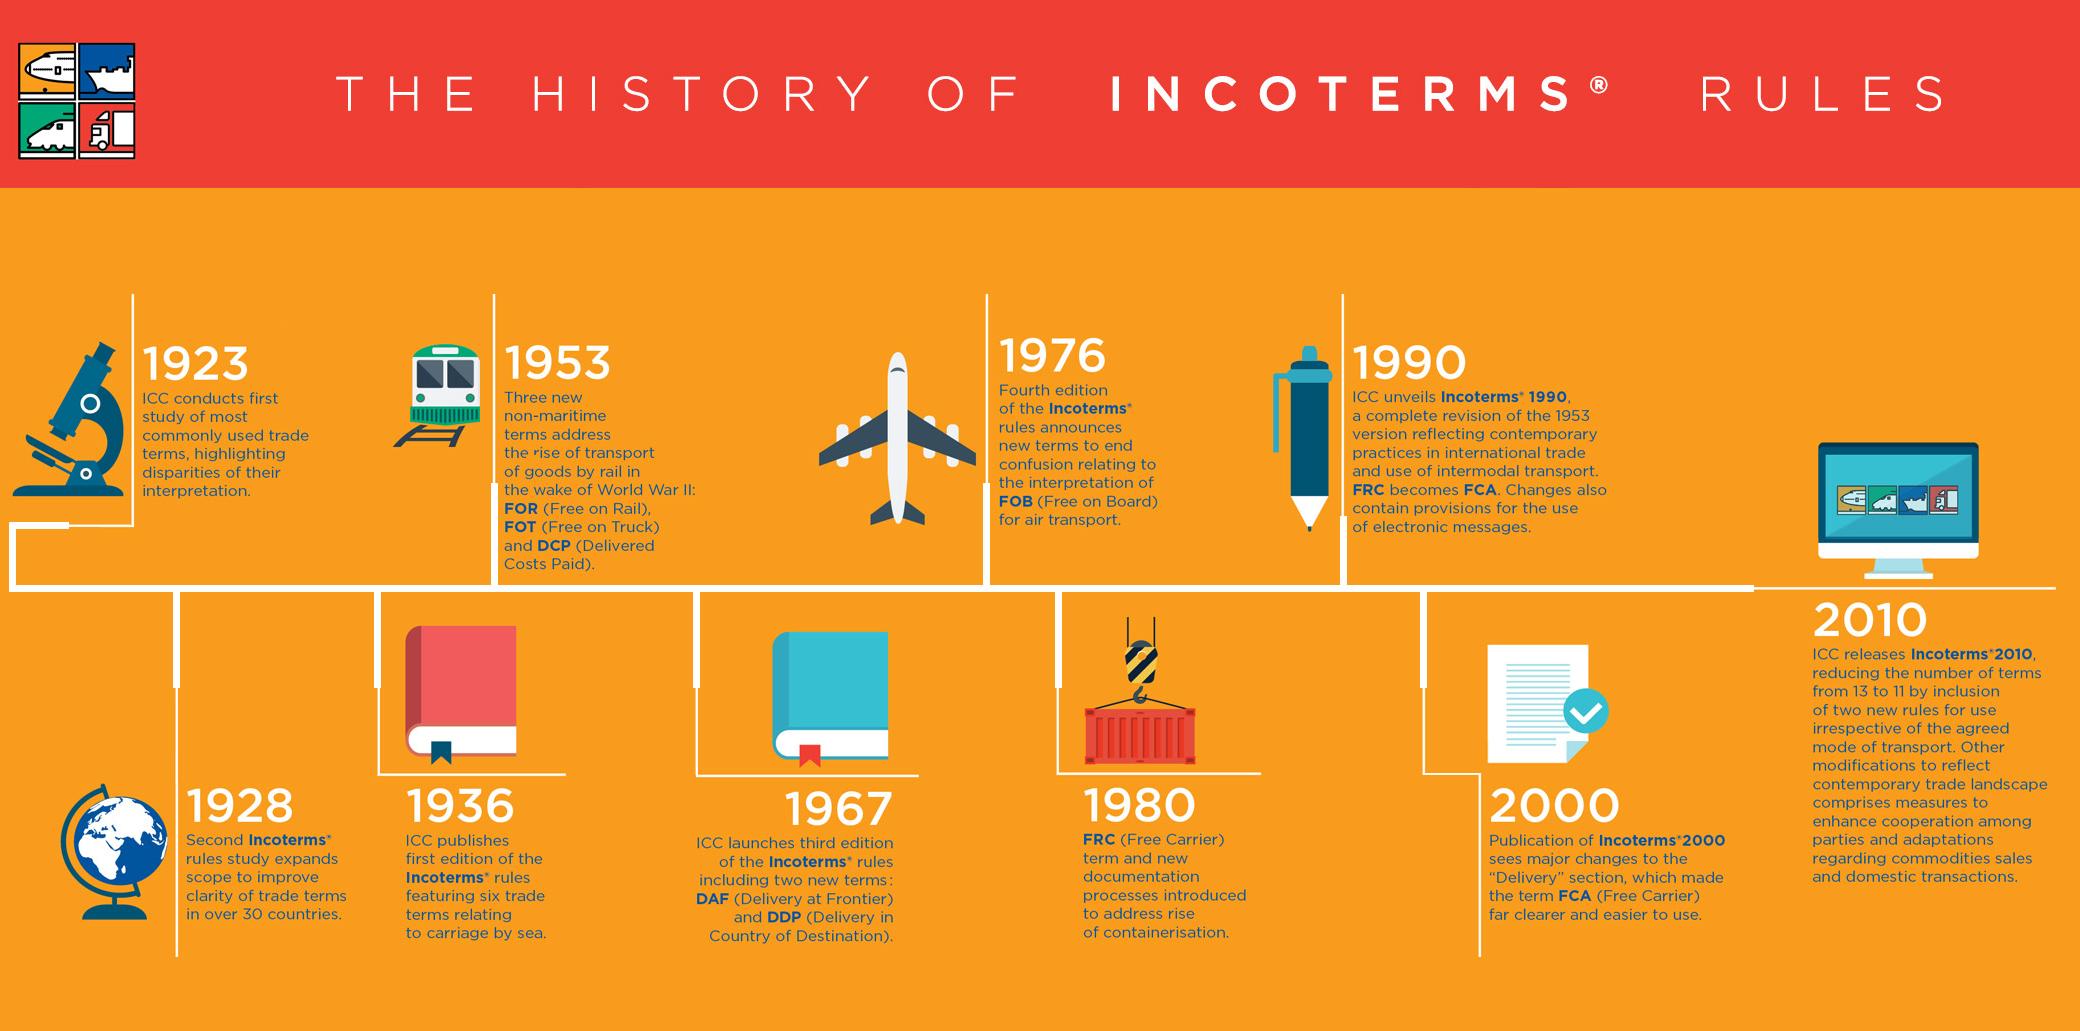 Lịch sử Incoterms